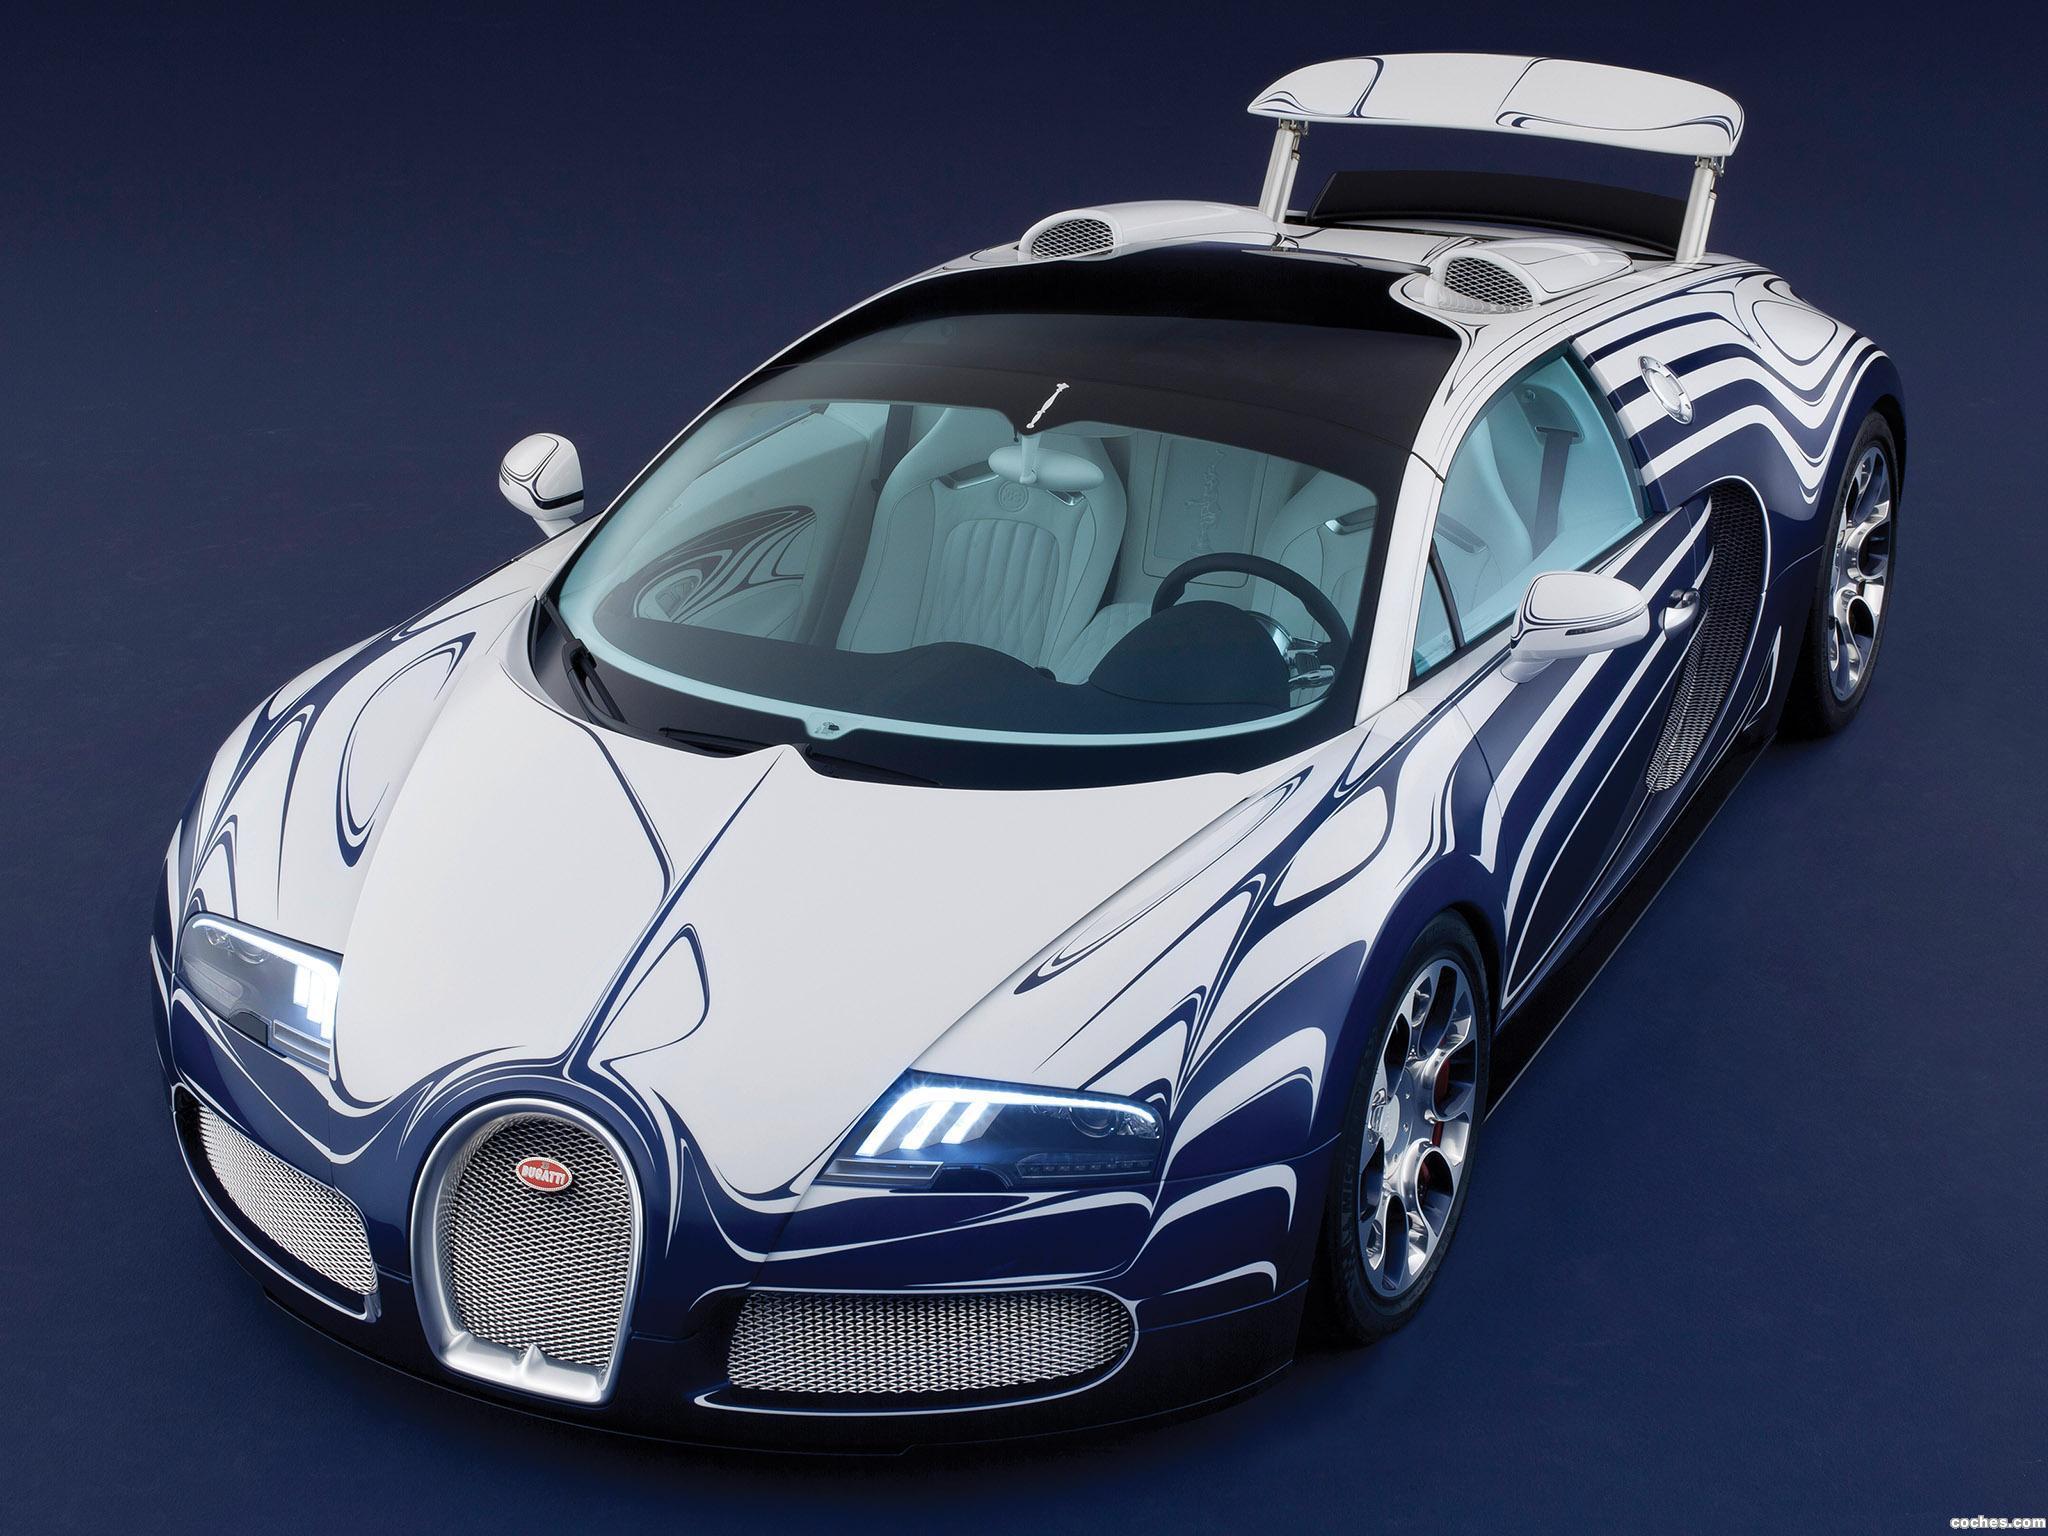 Foto 1 de Bugatti Veyron Grand Sport LOr Blanc 2011